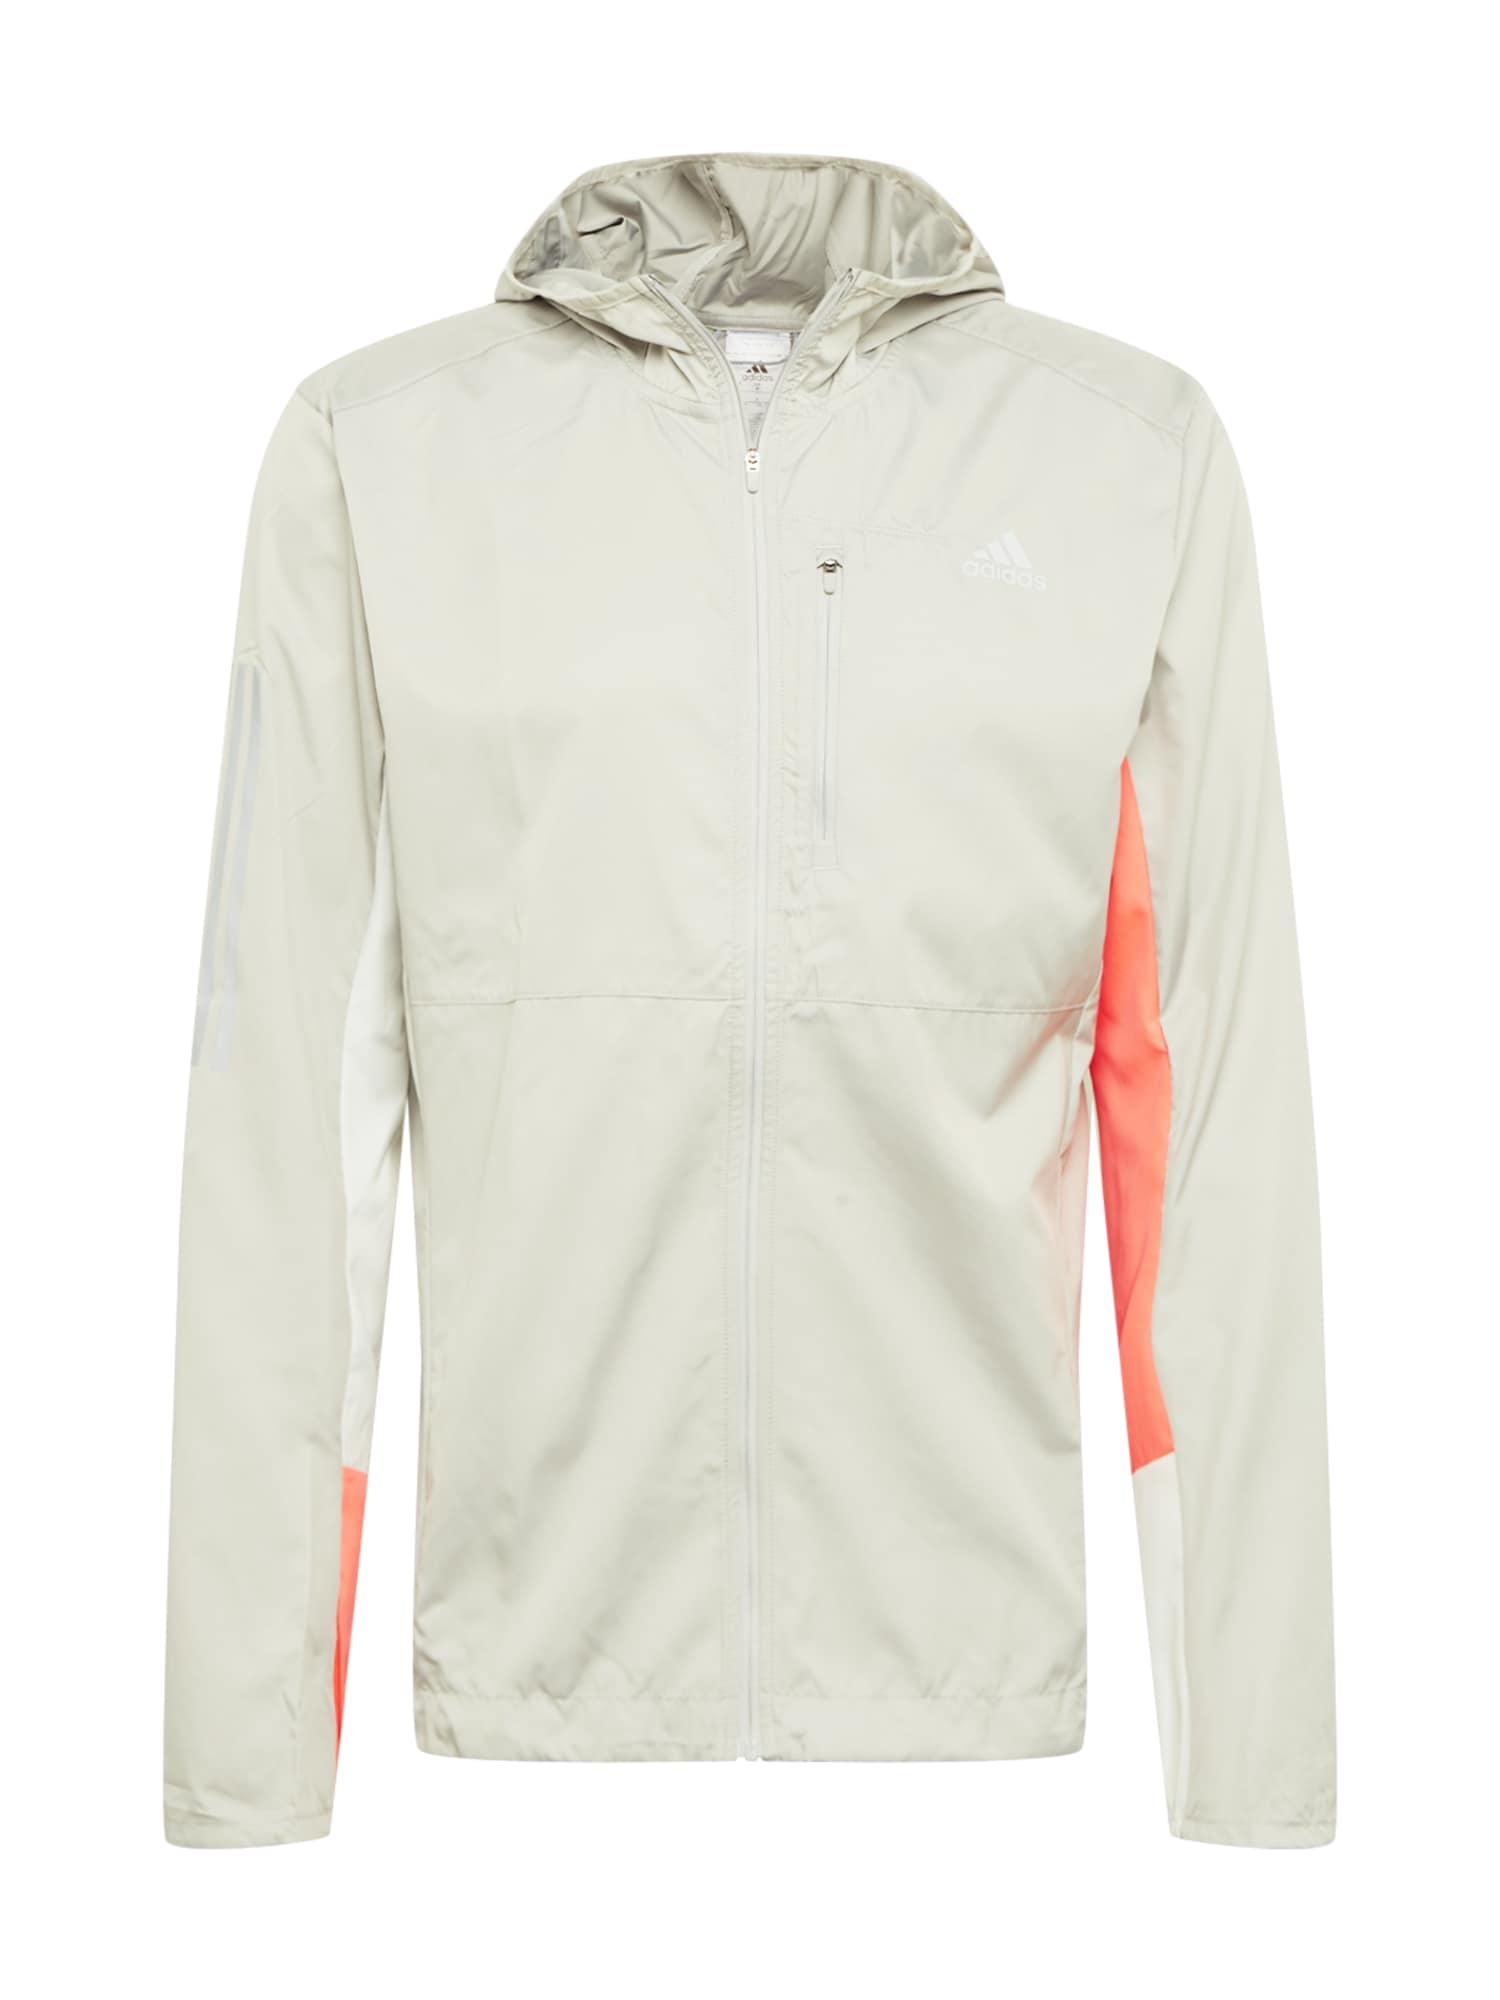 ADIDAS PERFORMANCE Sportovní bunda  oranžová / šedá